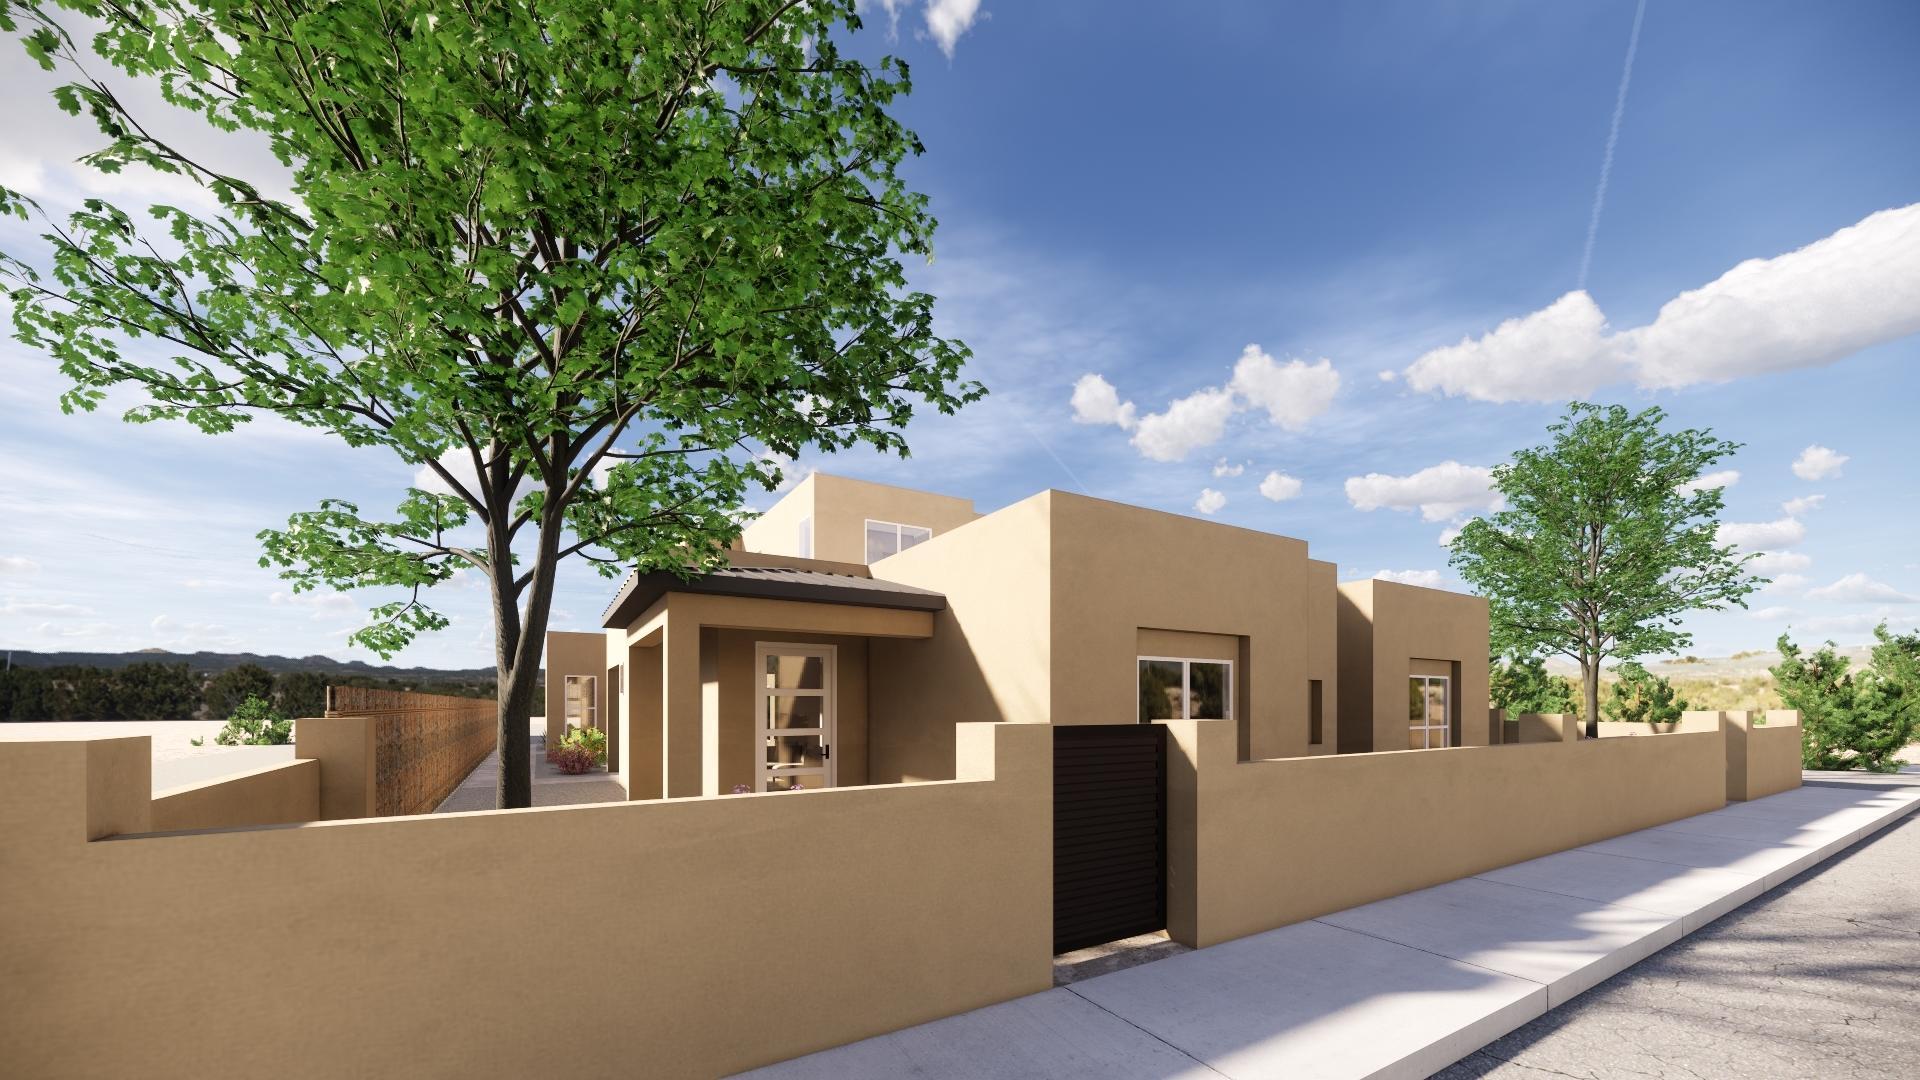 38 BLUE FEATHER Road, Santa Fe, NM 87508 - Santa Fe, NM real estate listing